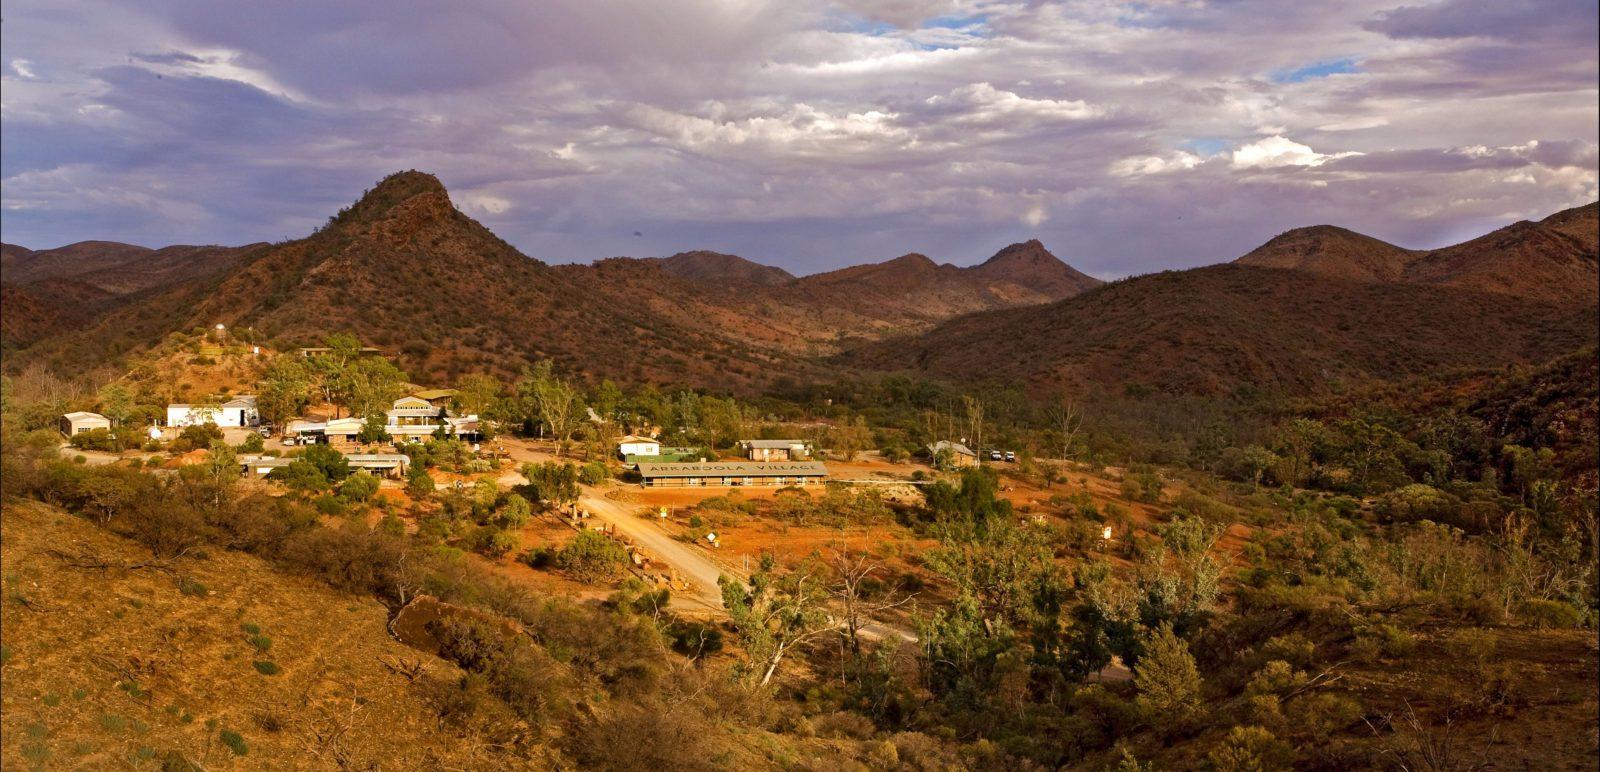 Arkaroola Village from West